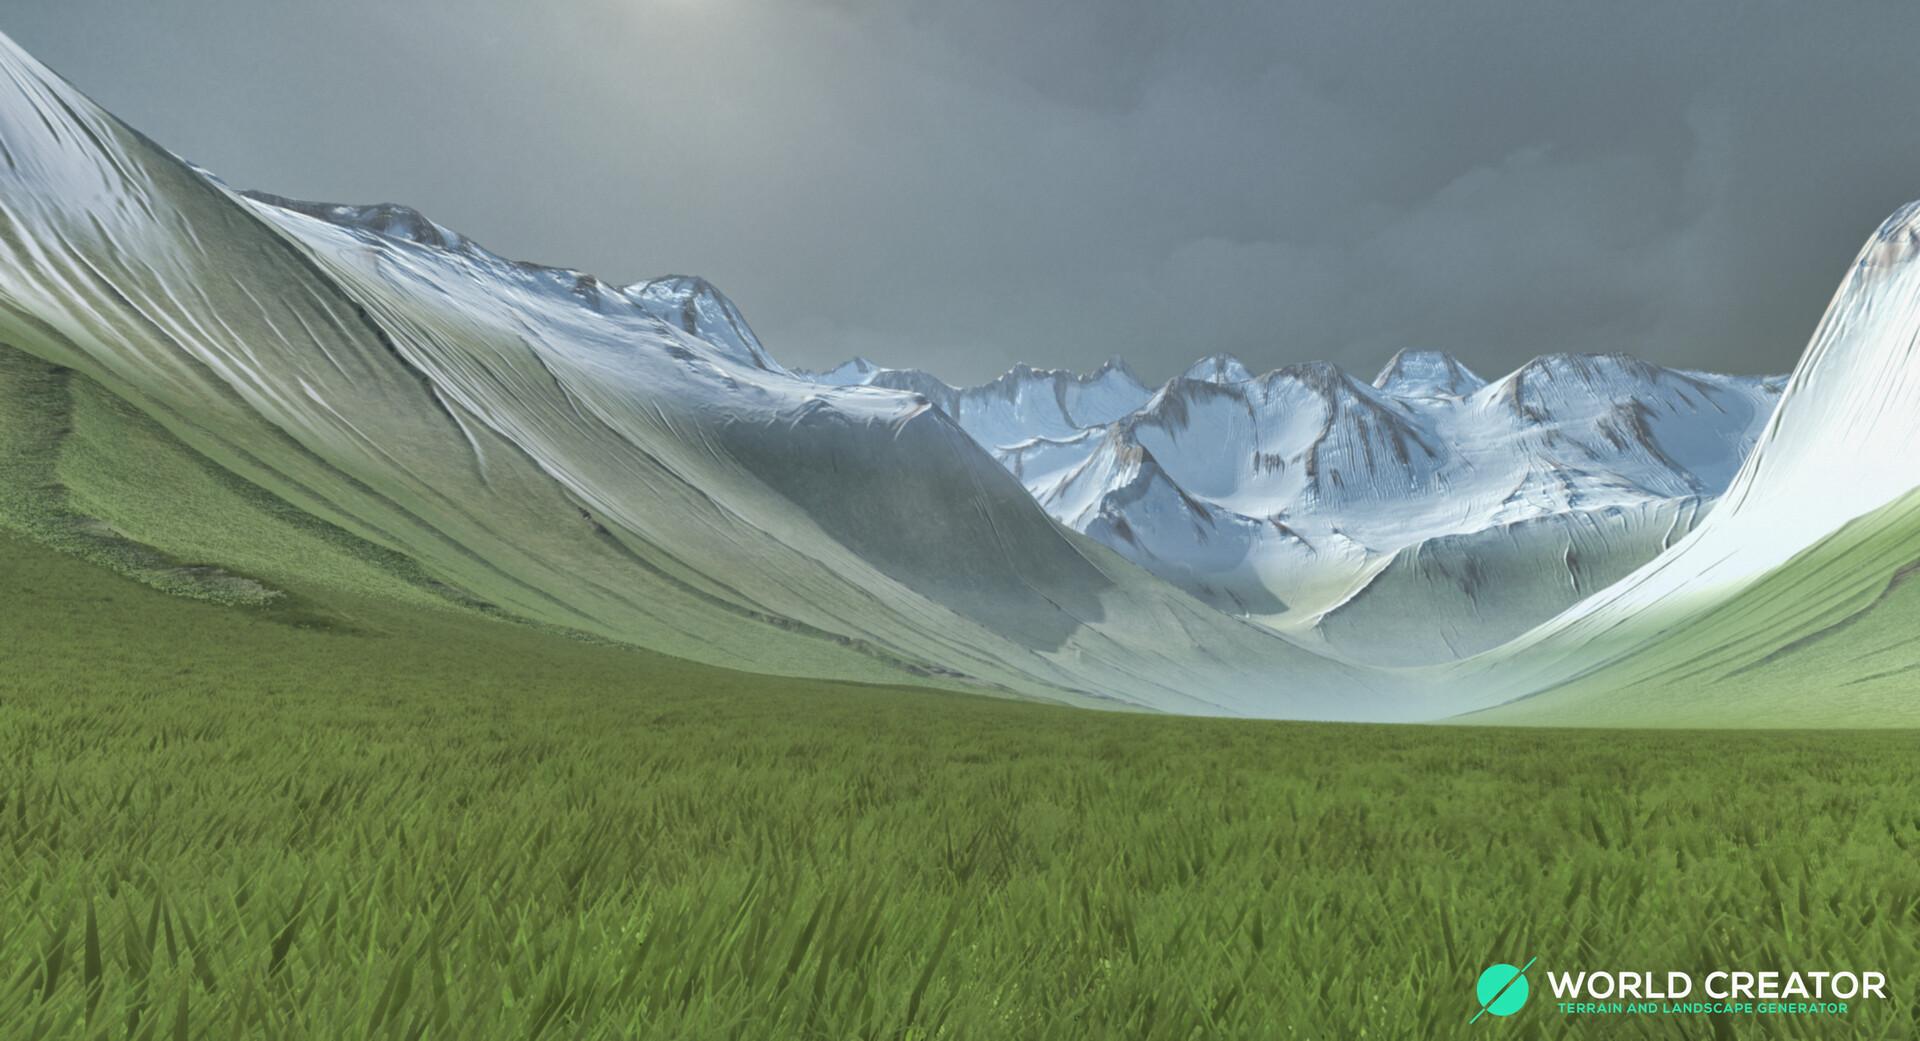 david-pistelak-alpines1.jpg